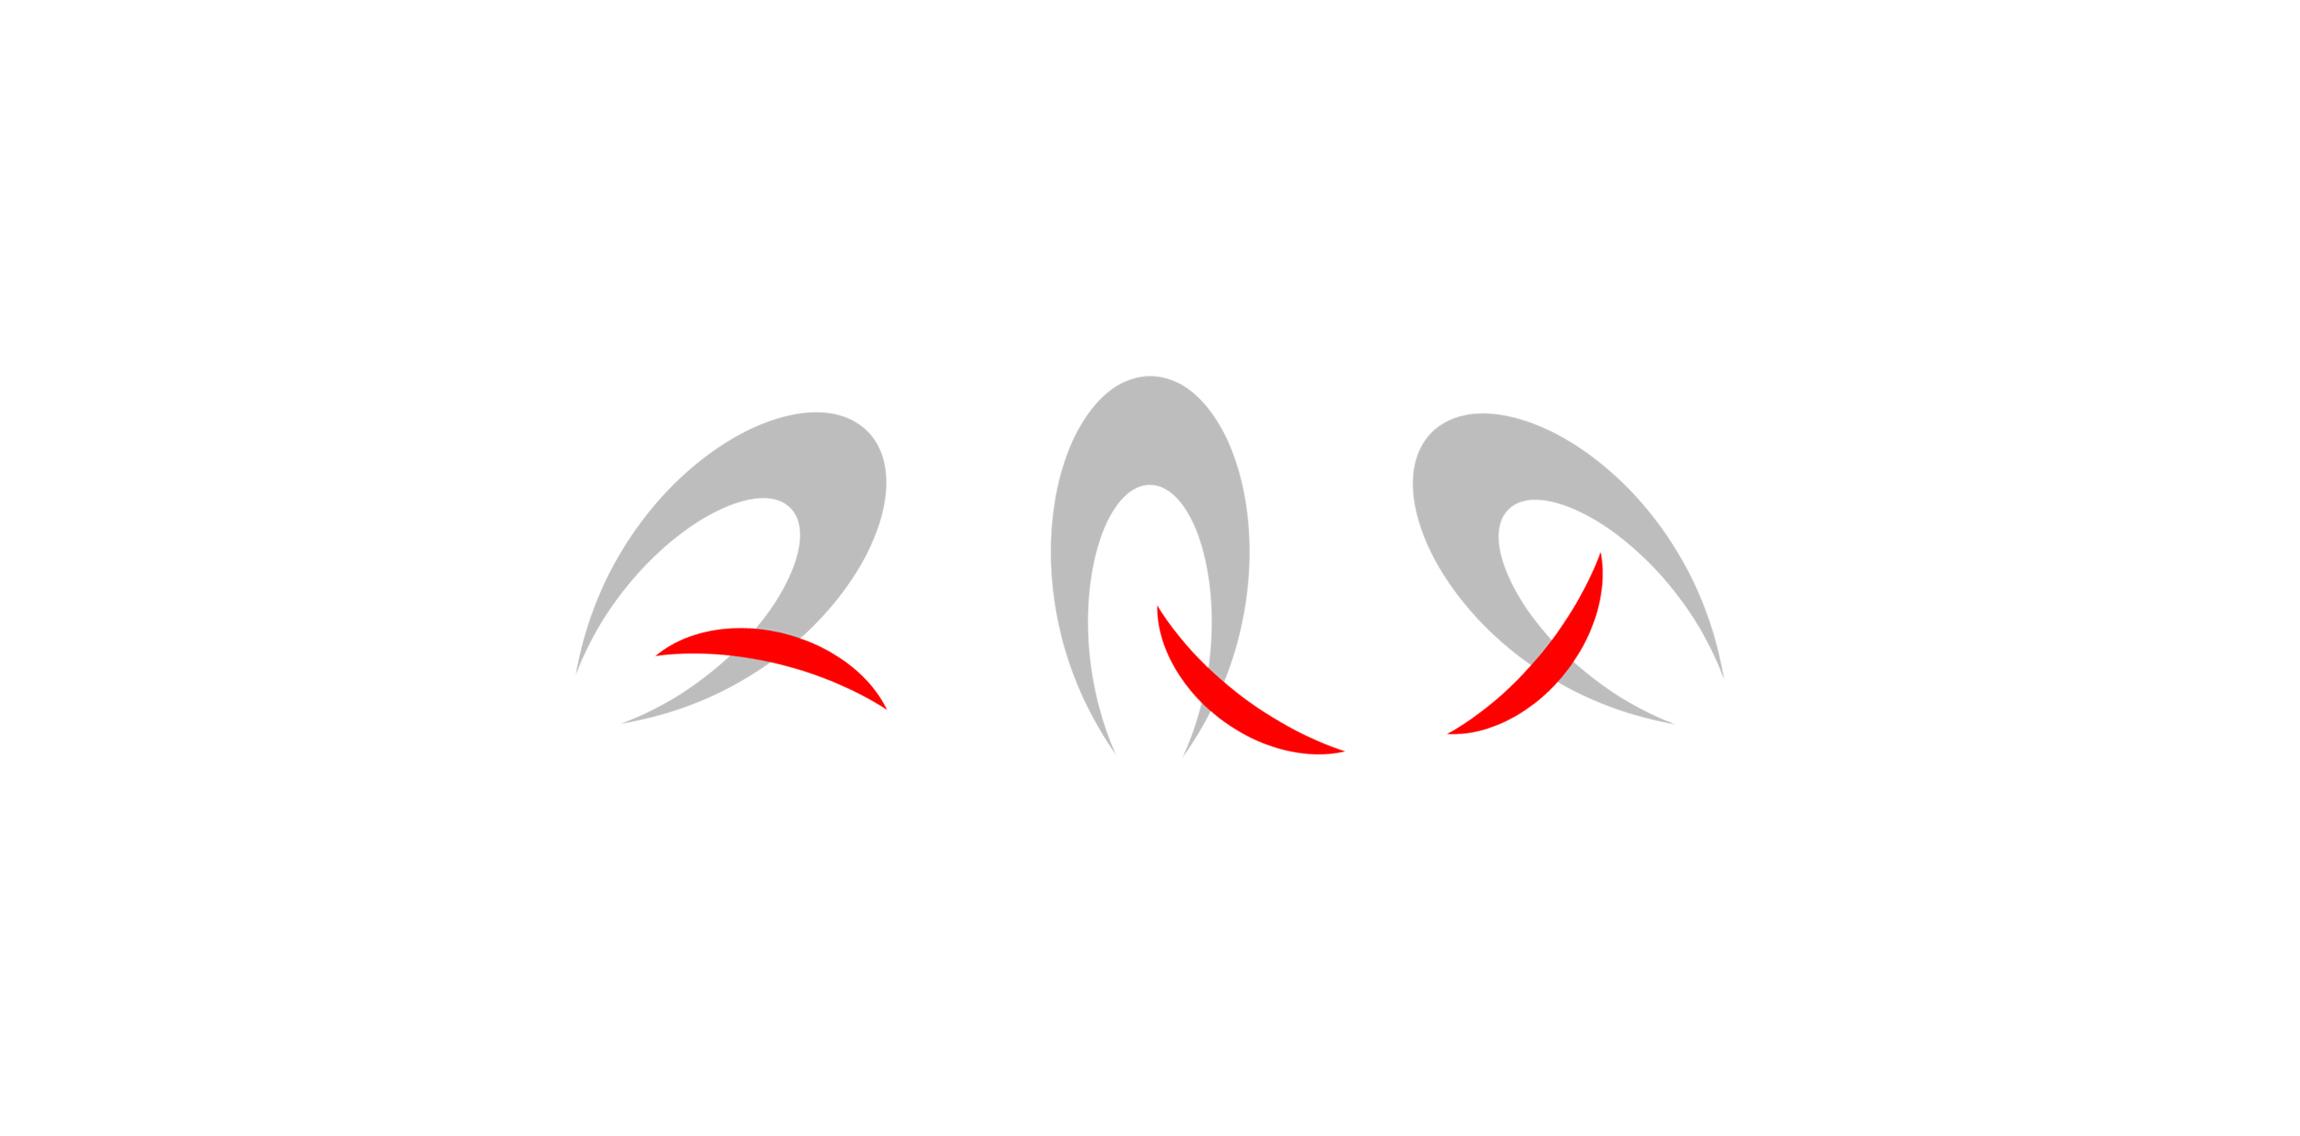 ARC 205